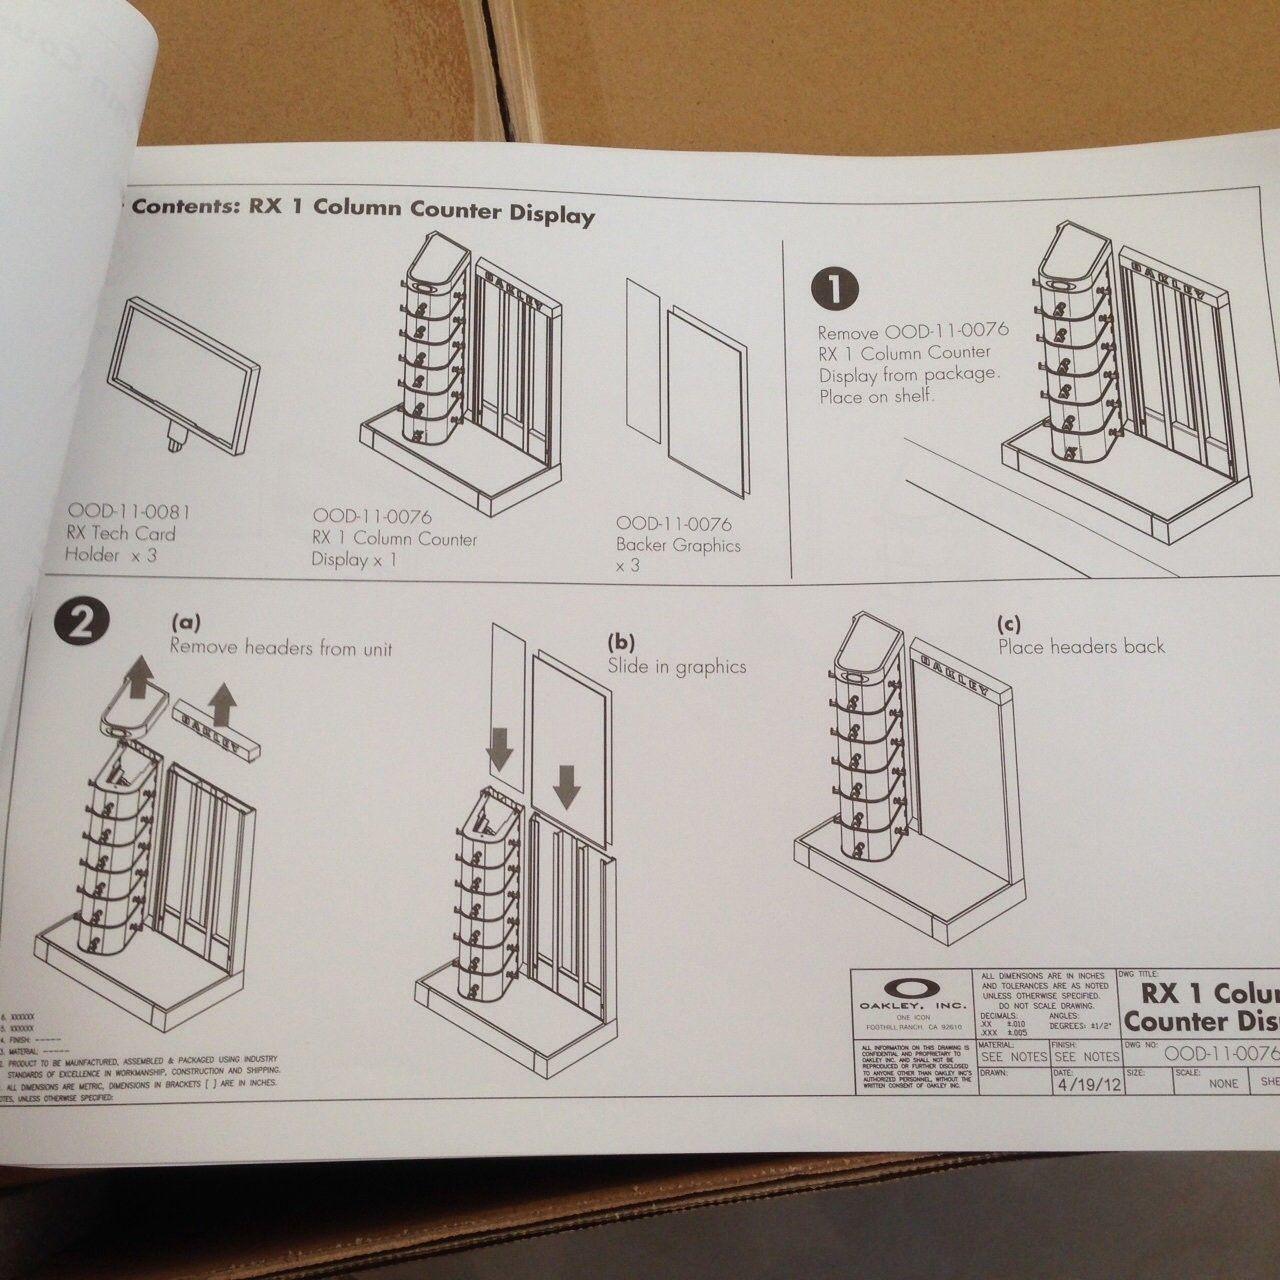 New in Box Oakley Counter Display - IMG_7807.JPG